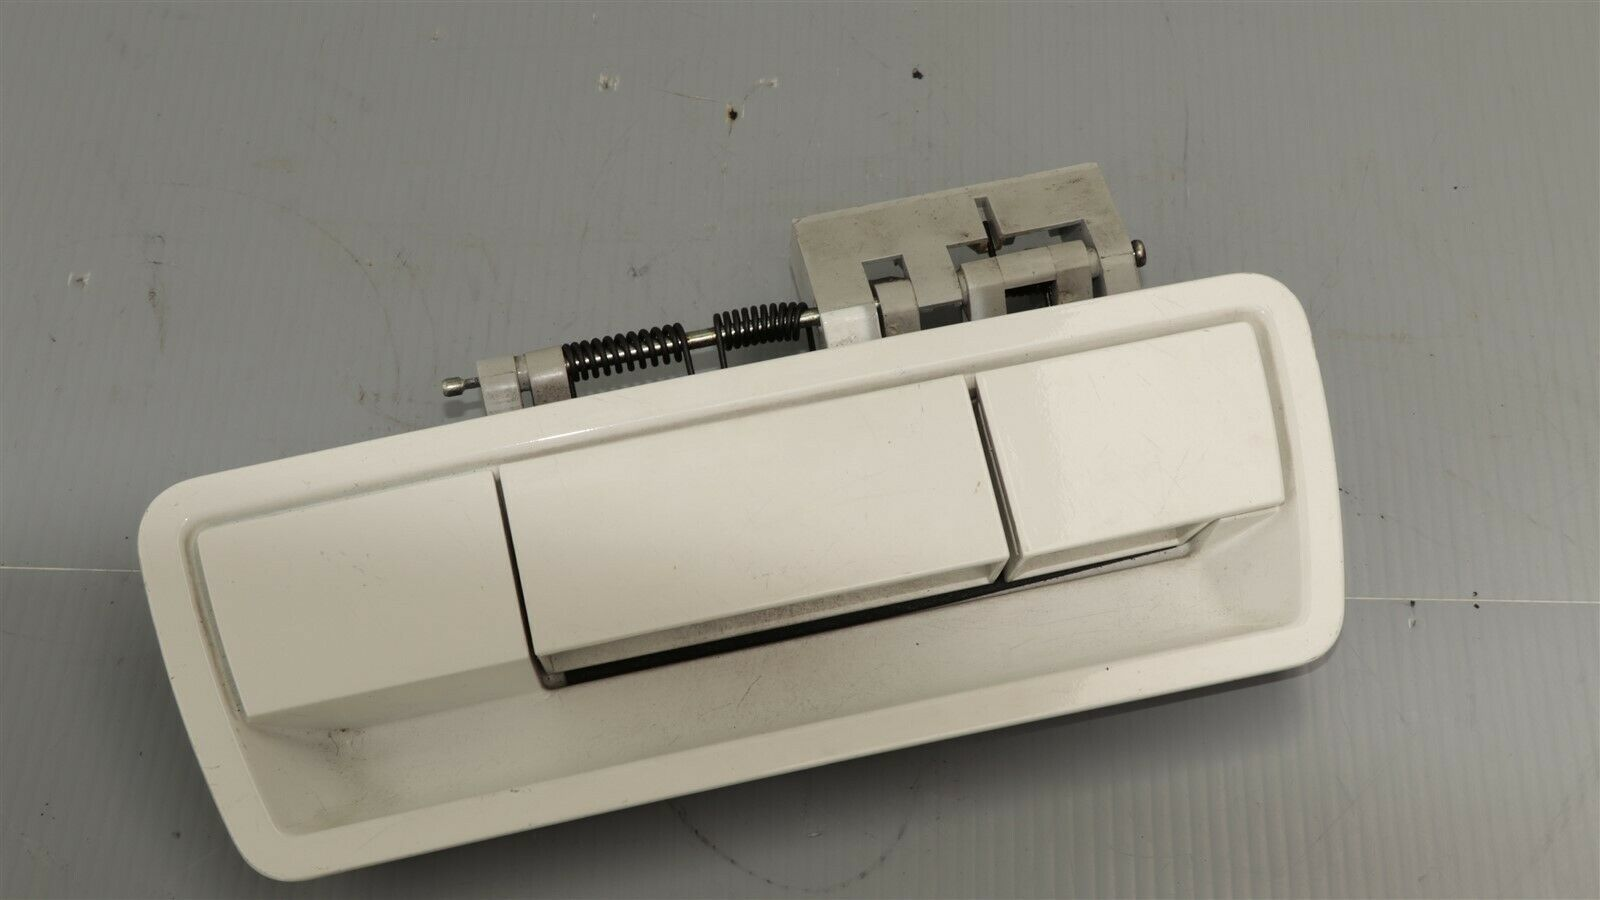 04-12 Nissan Armada Rear Hatch Tailgate Liftgate Trunk Exterior Door Handle WHT